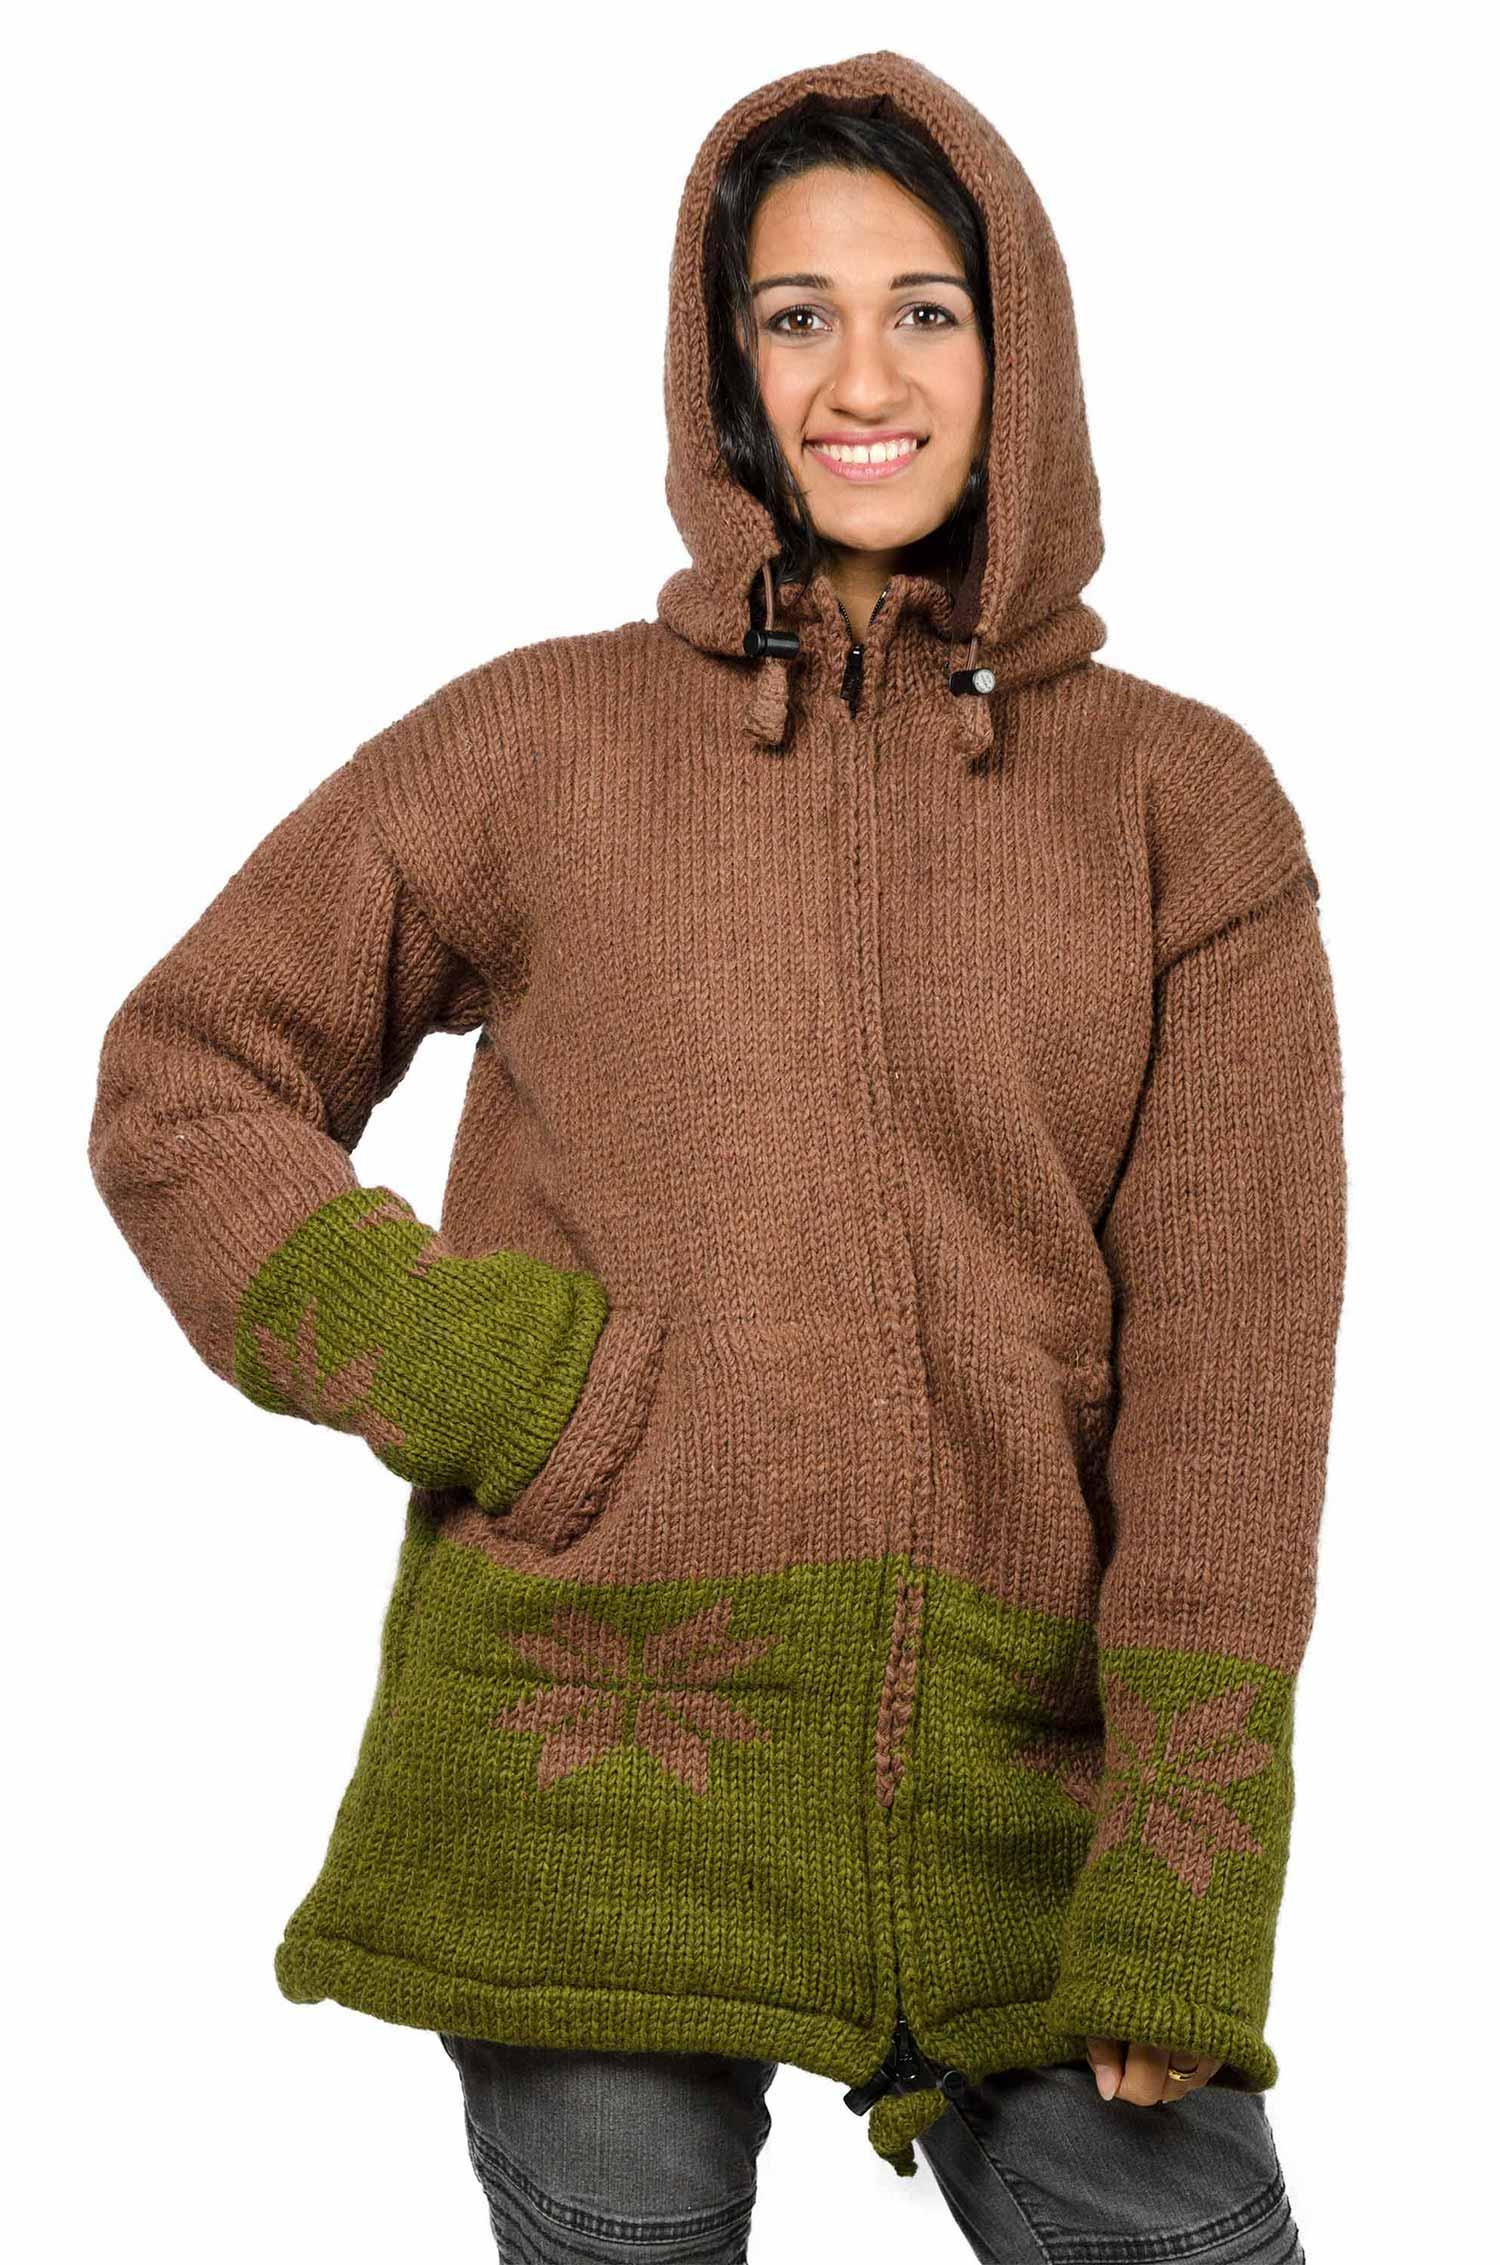 Wool Snowflake Himalayan Mountain Jacket – Long Length Brown & Olive